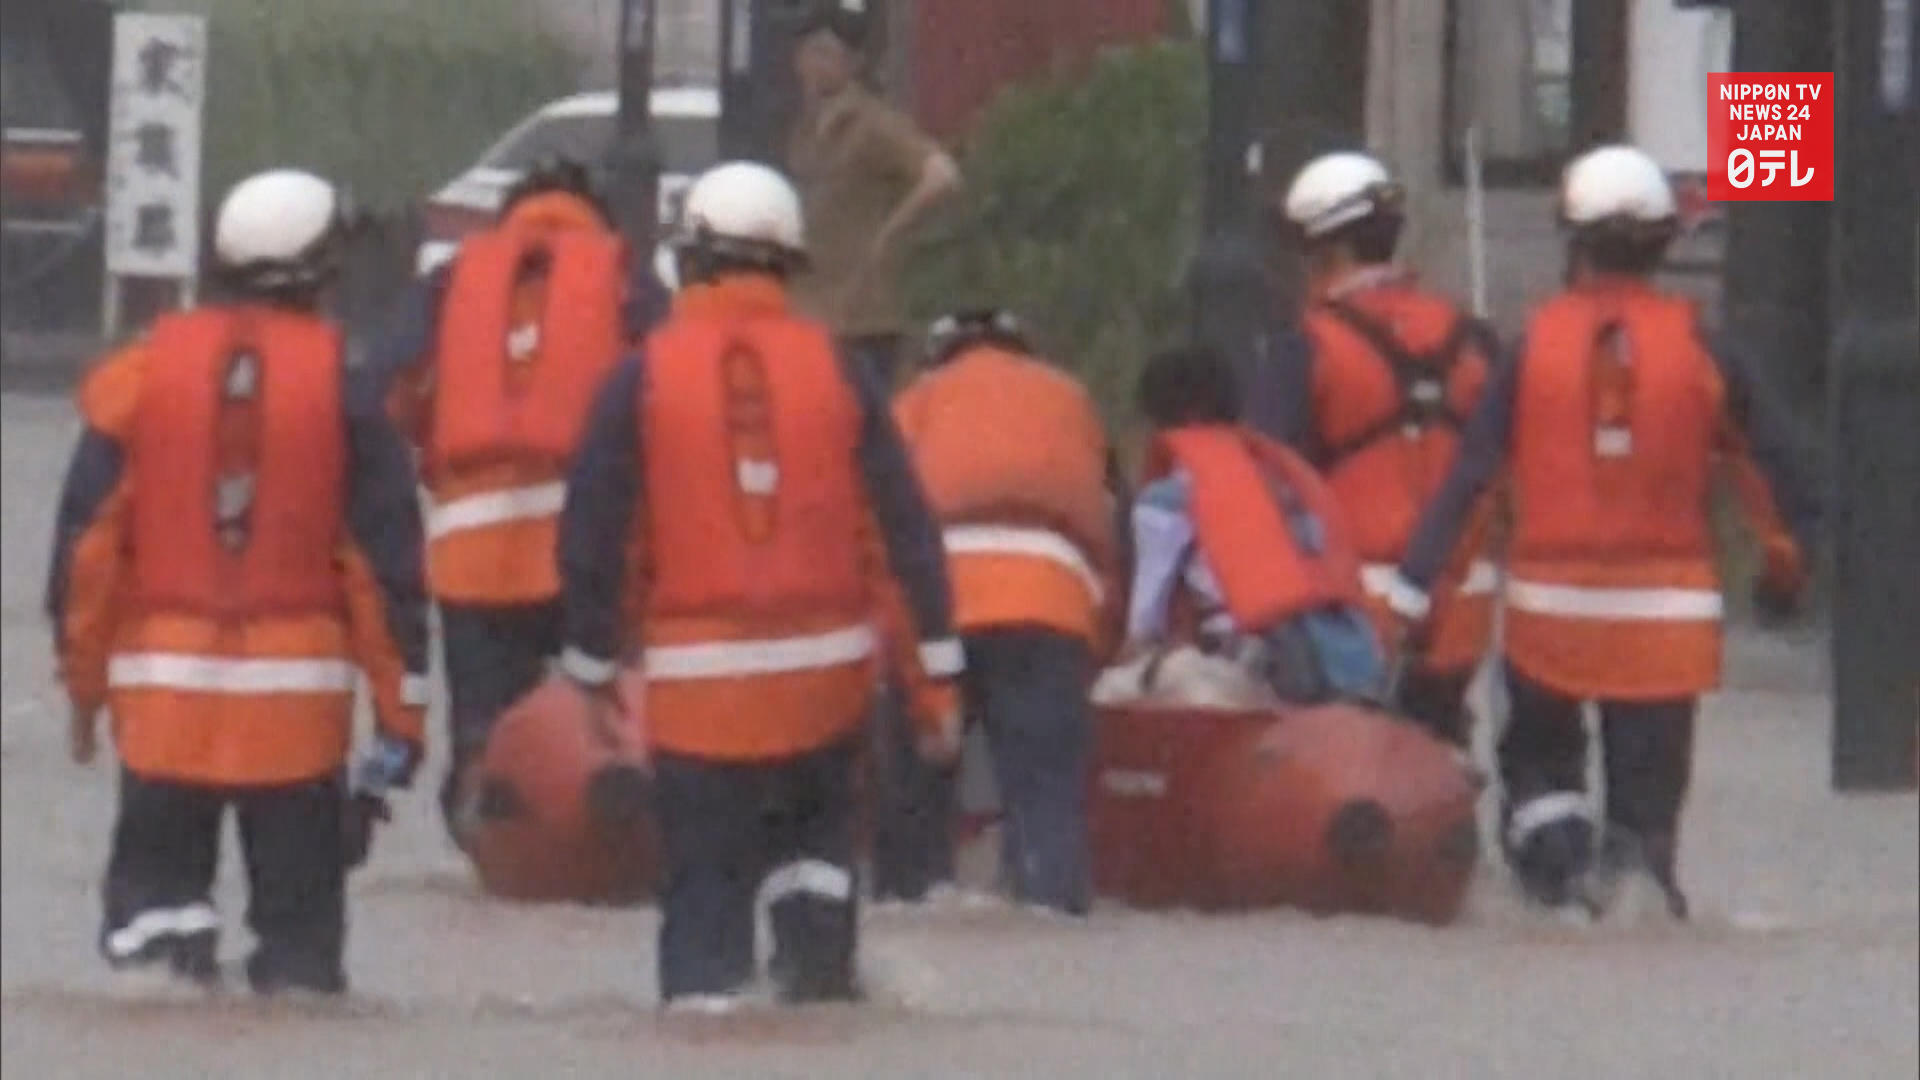 Torrential rains hit southwestern Japan